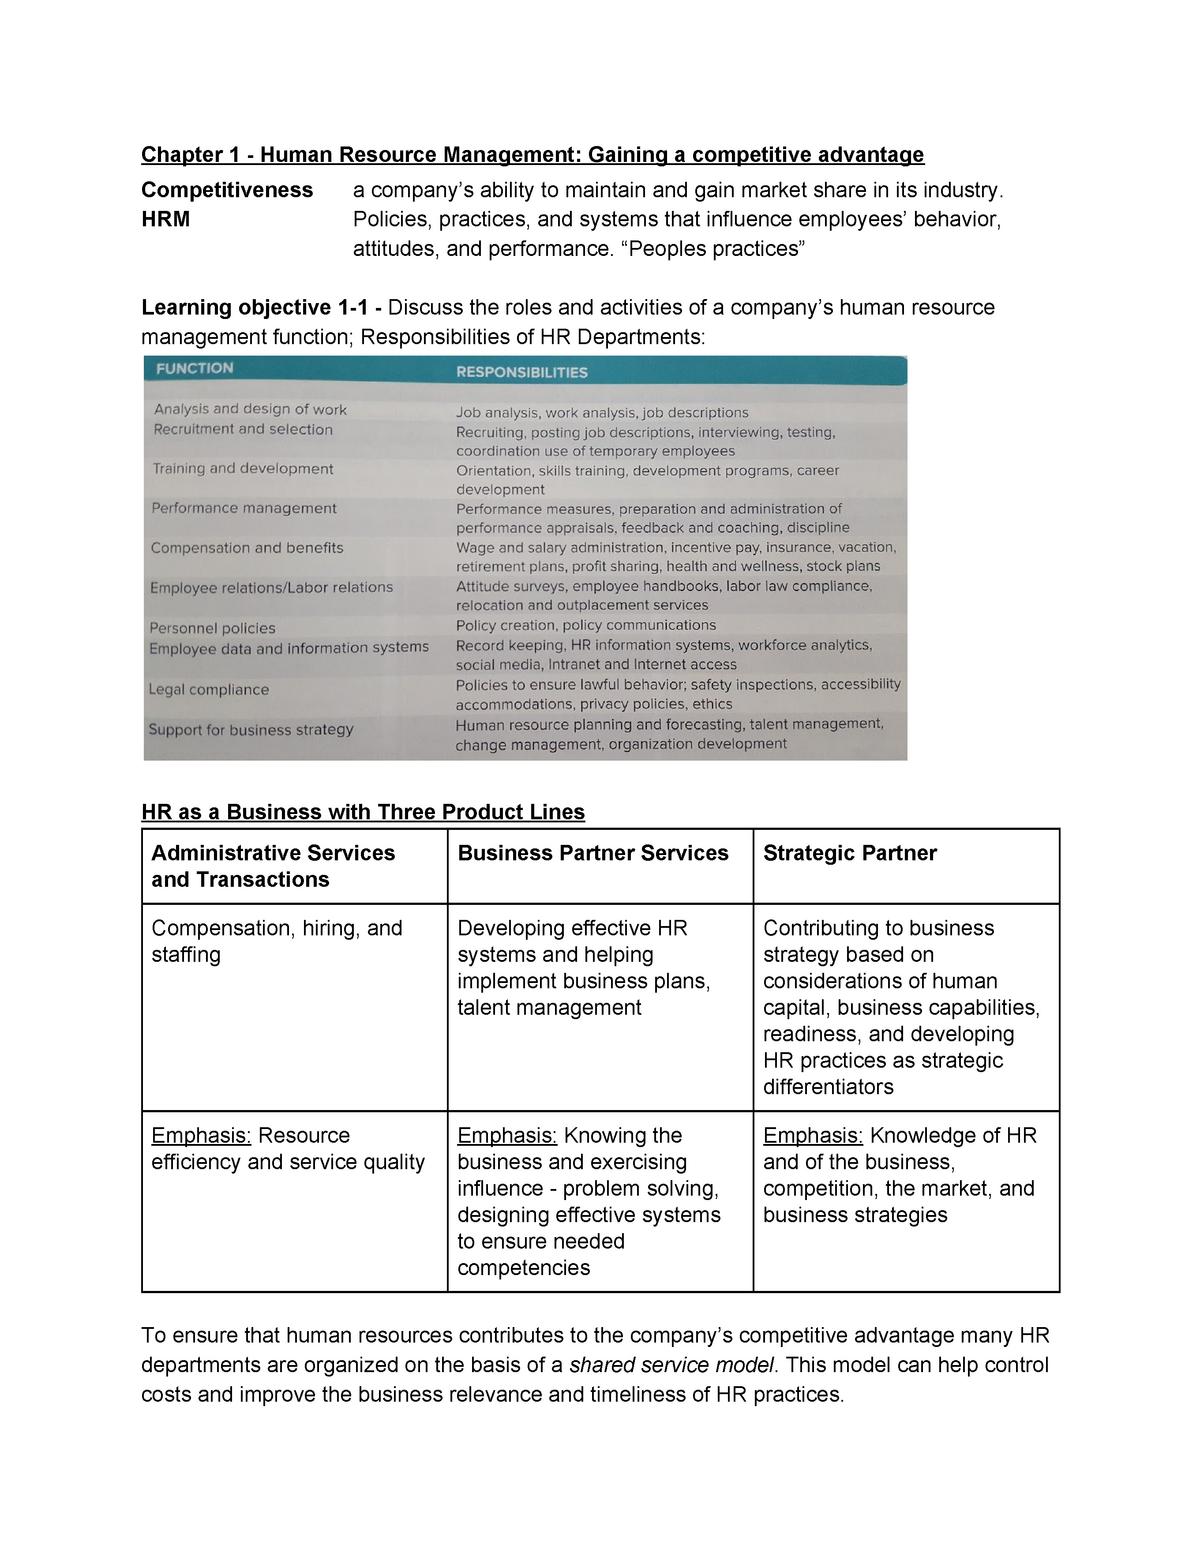 HRM - Gaining a competitive advantage - EBB617B05 - RUG